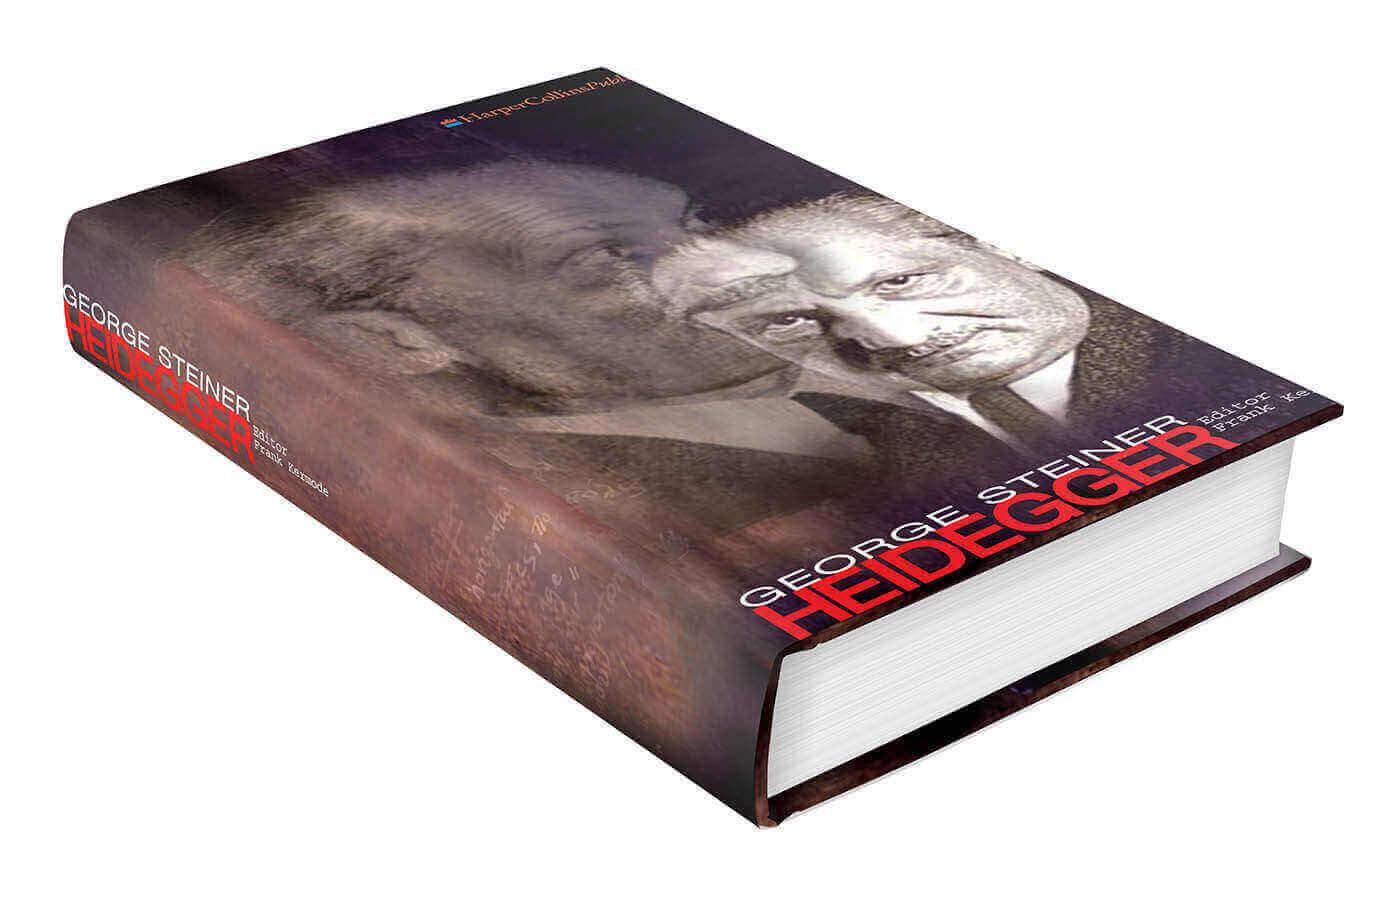 Philosophy Book Cover Illustration Design